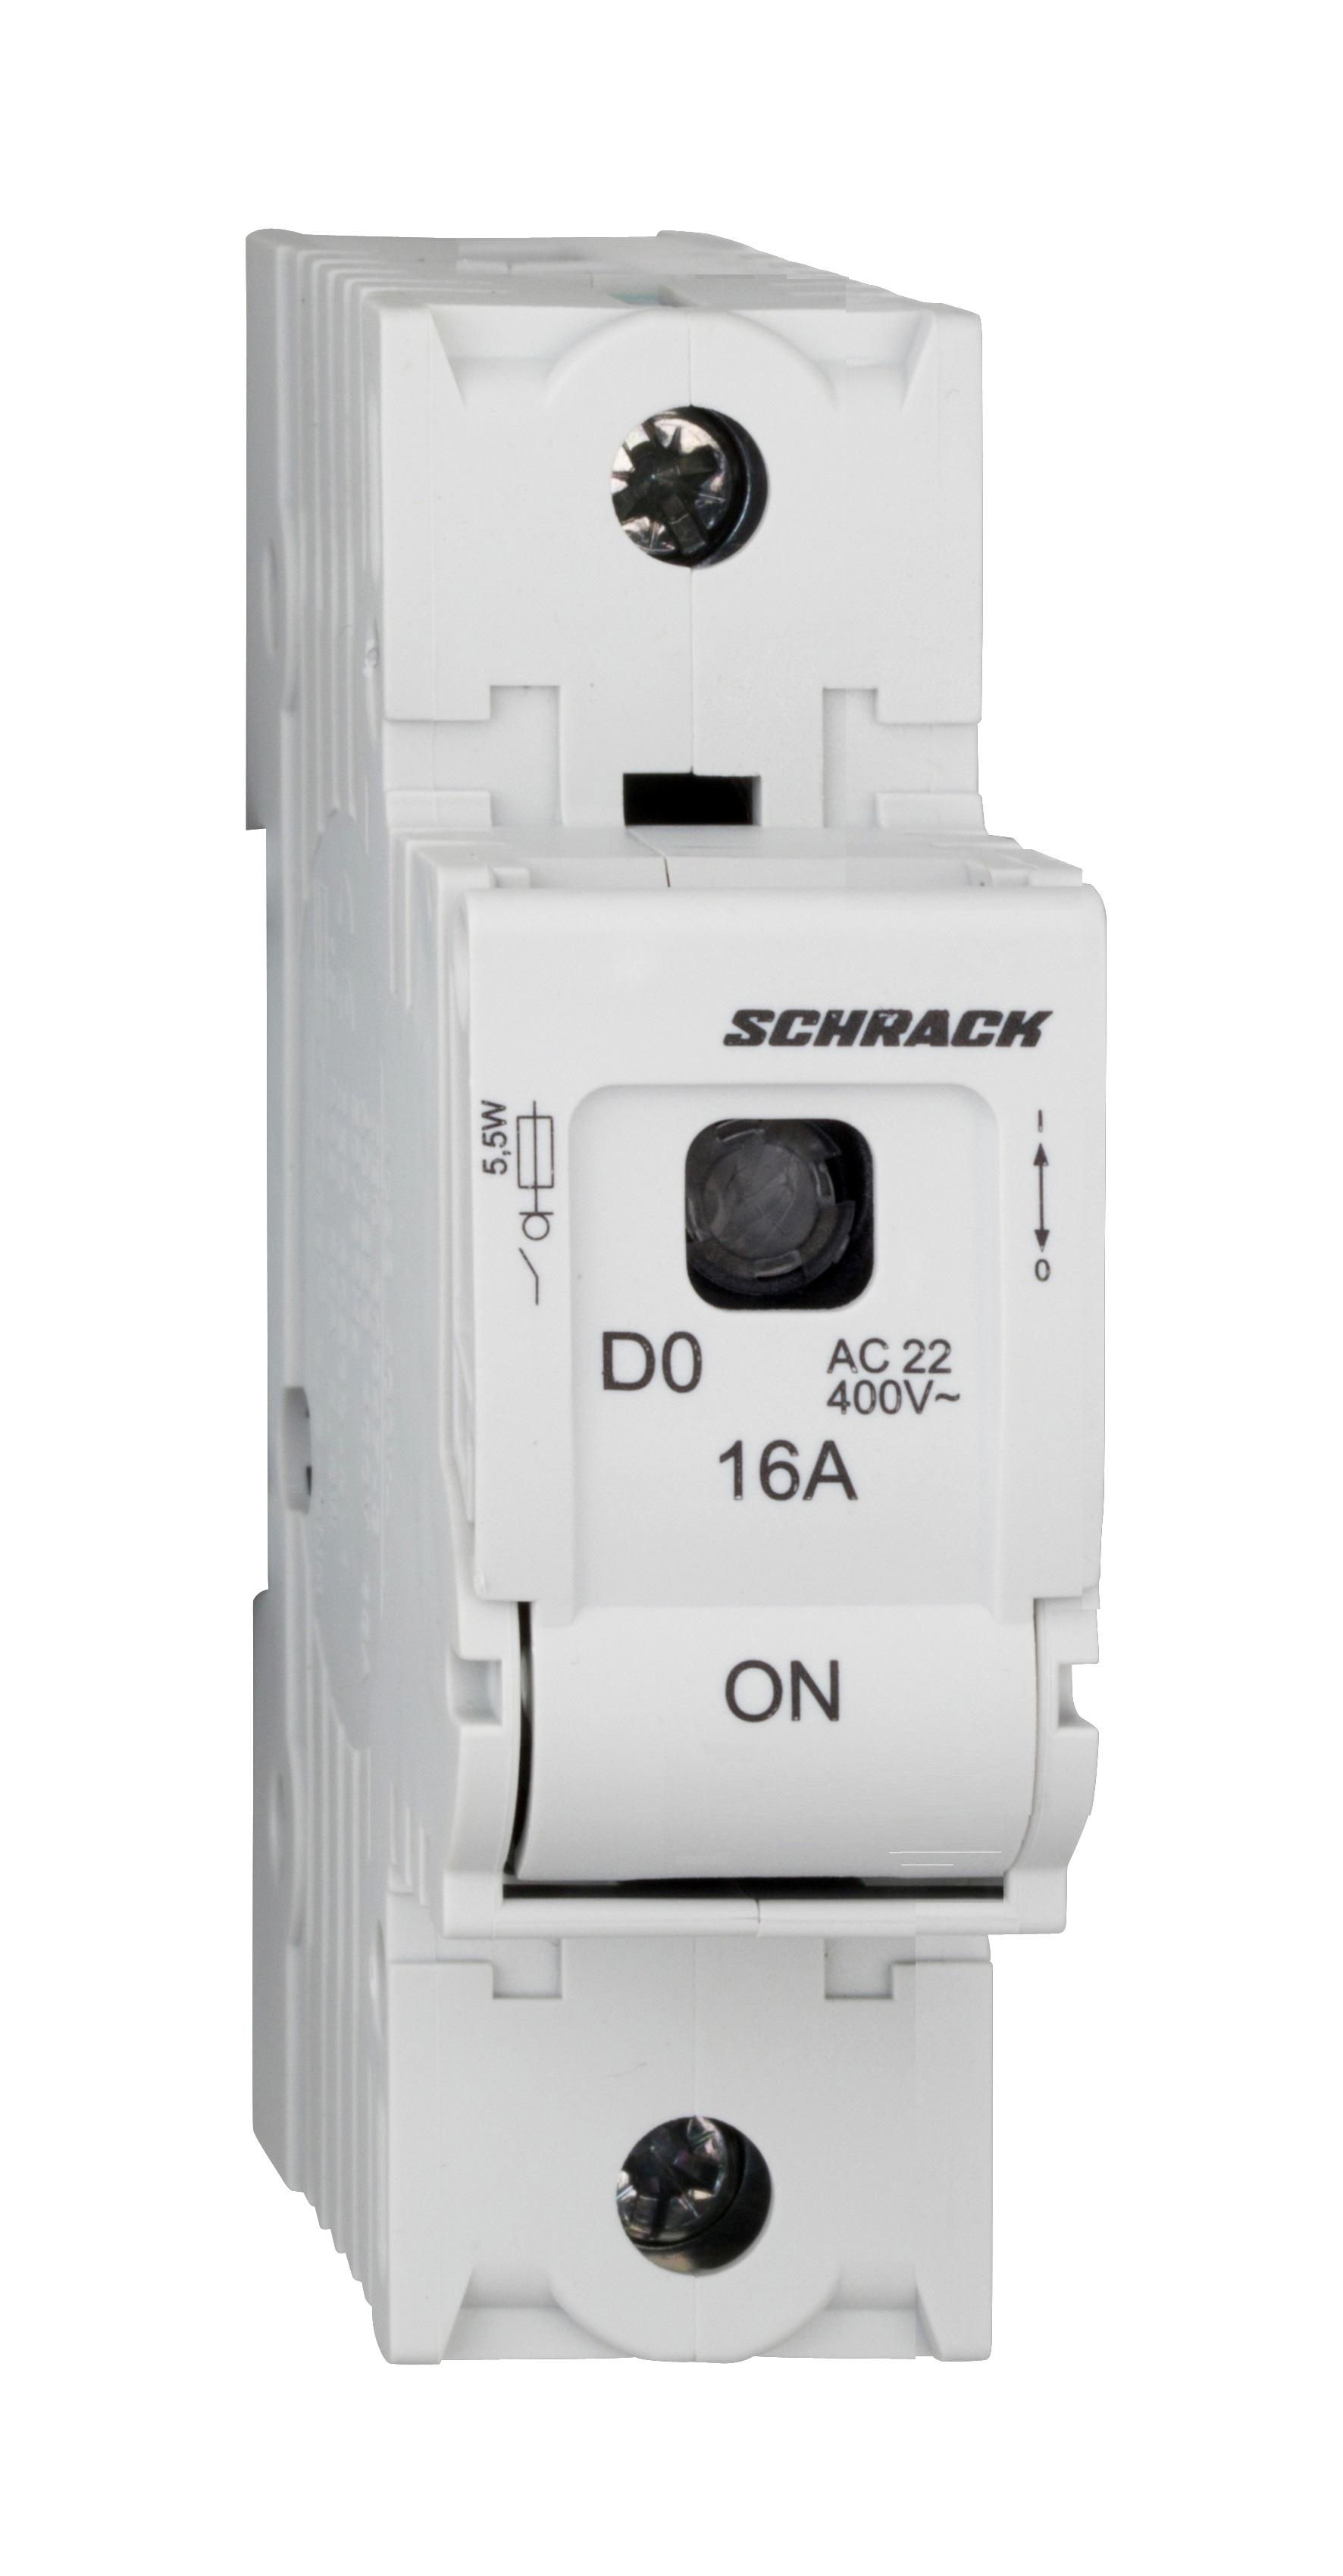 1 Stk D02-Lasttrennschalter ARROW S, 1-polig, 16A IS503701--